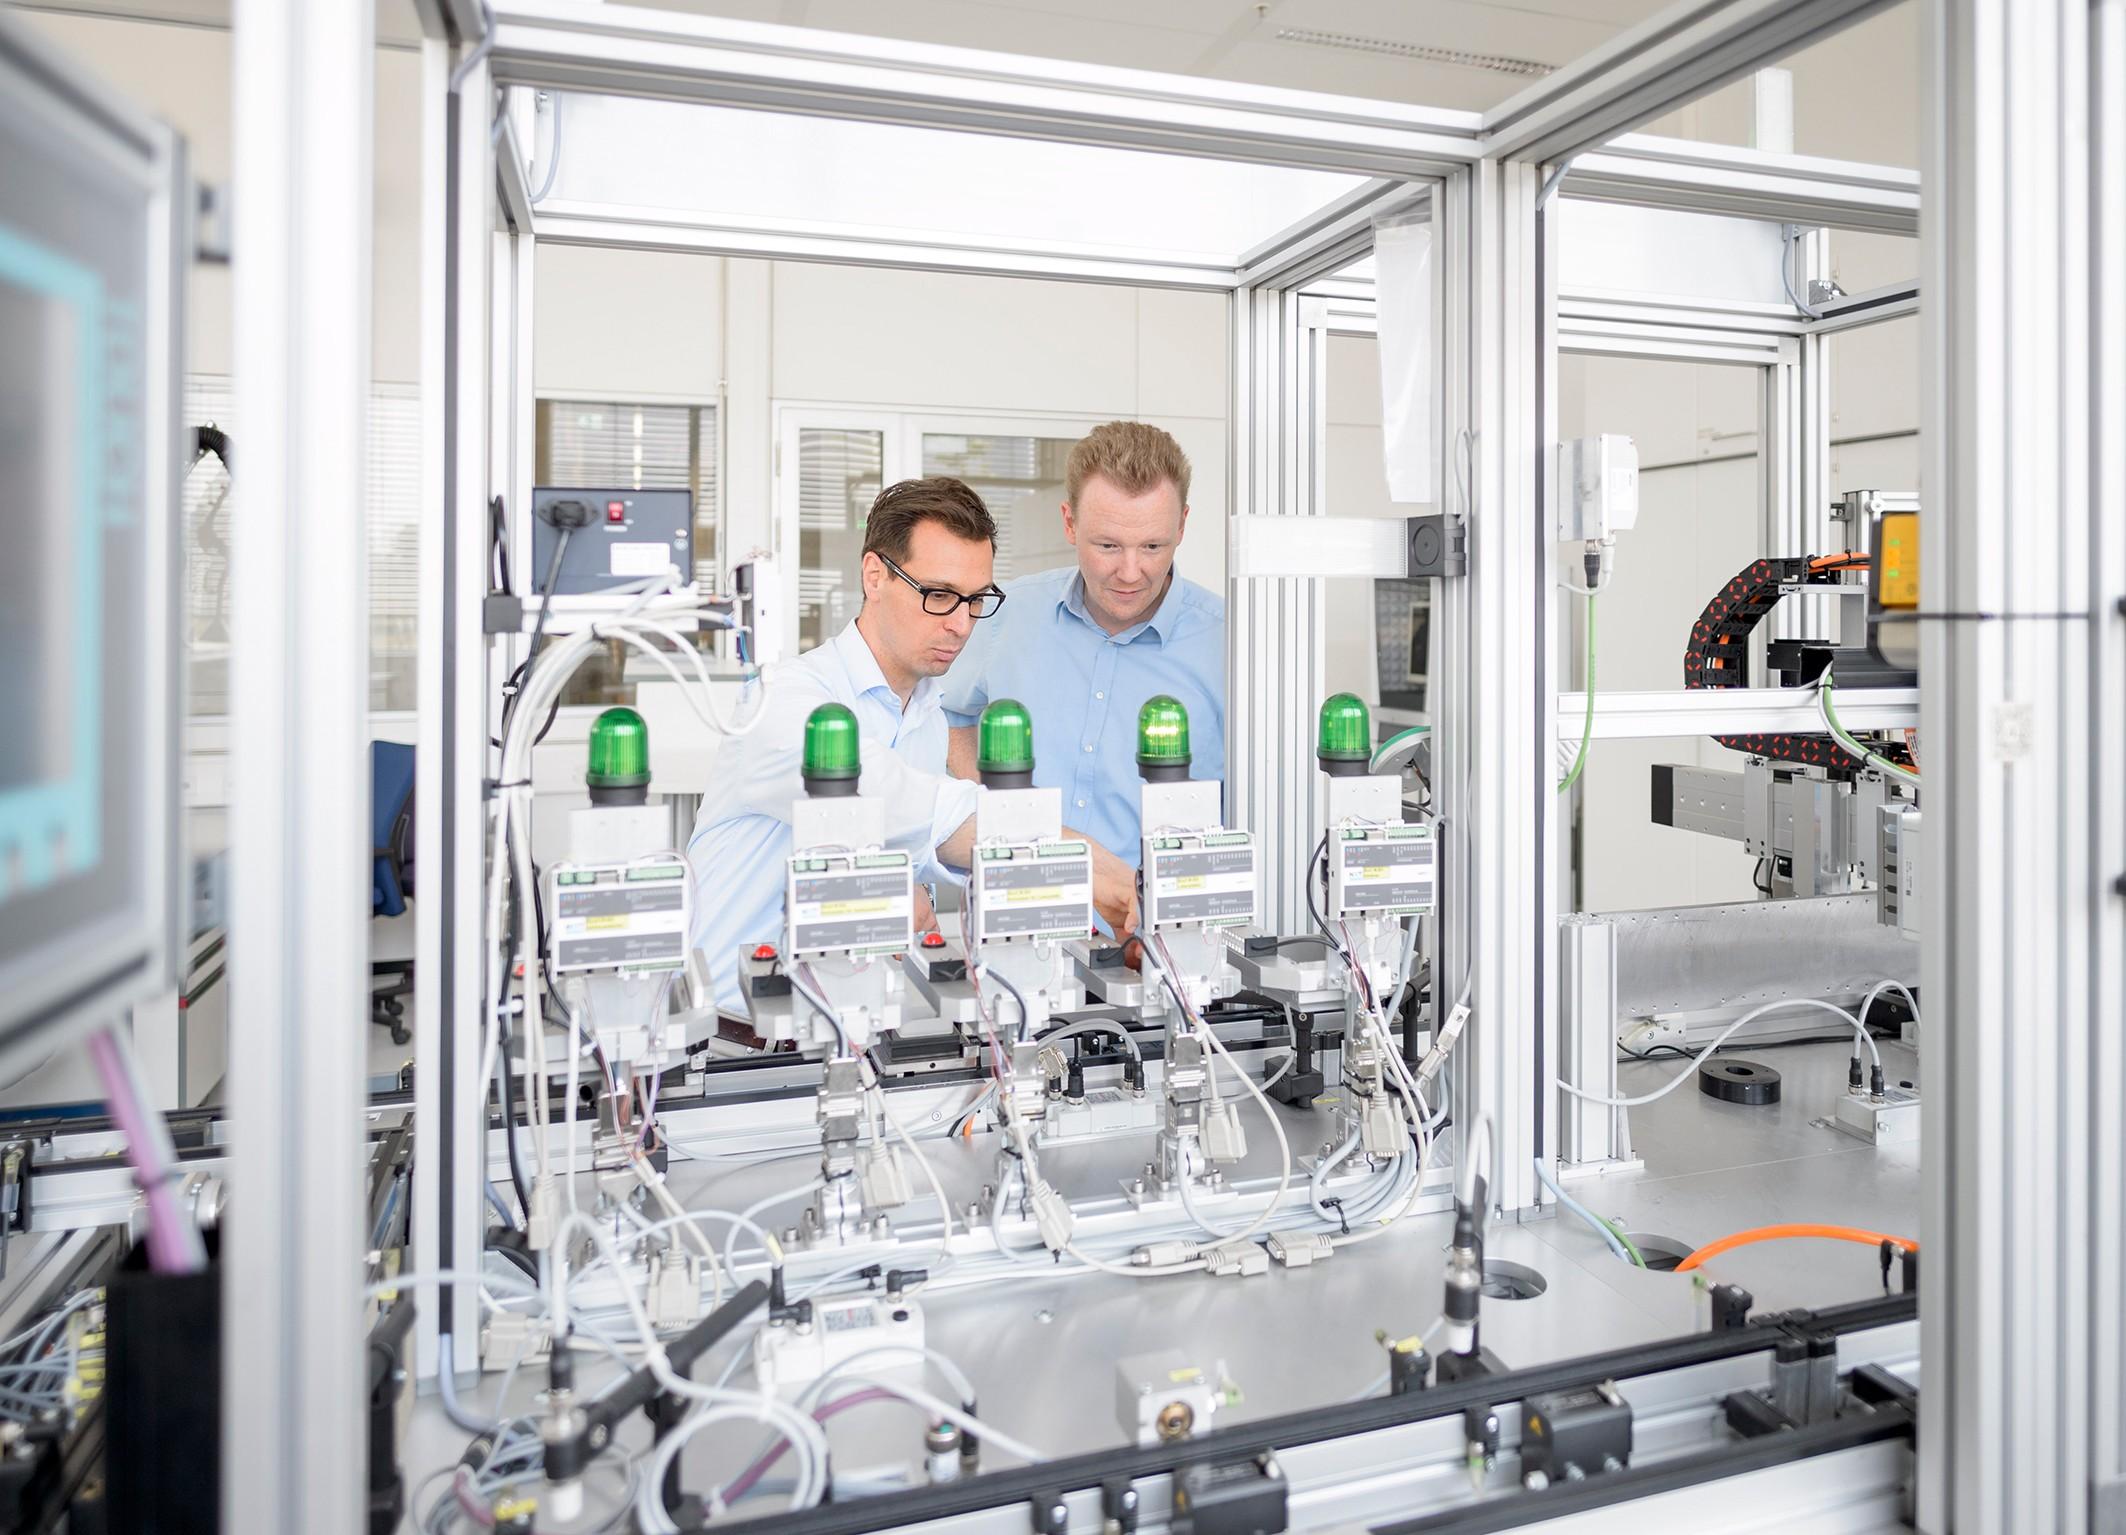 Machine sensors will generate vast quantities of data